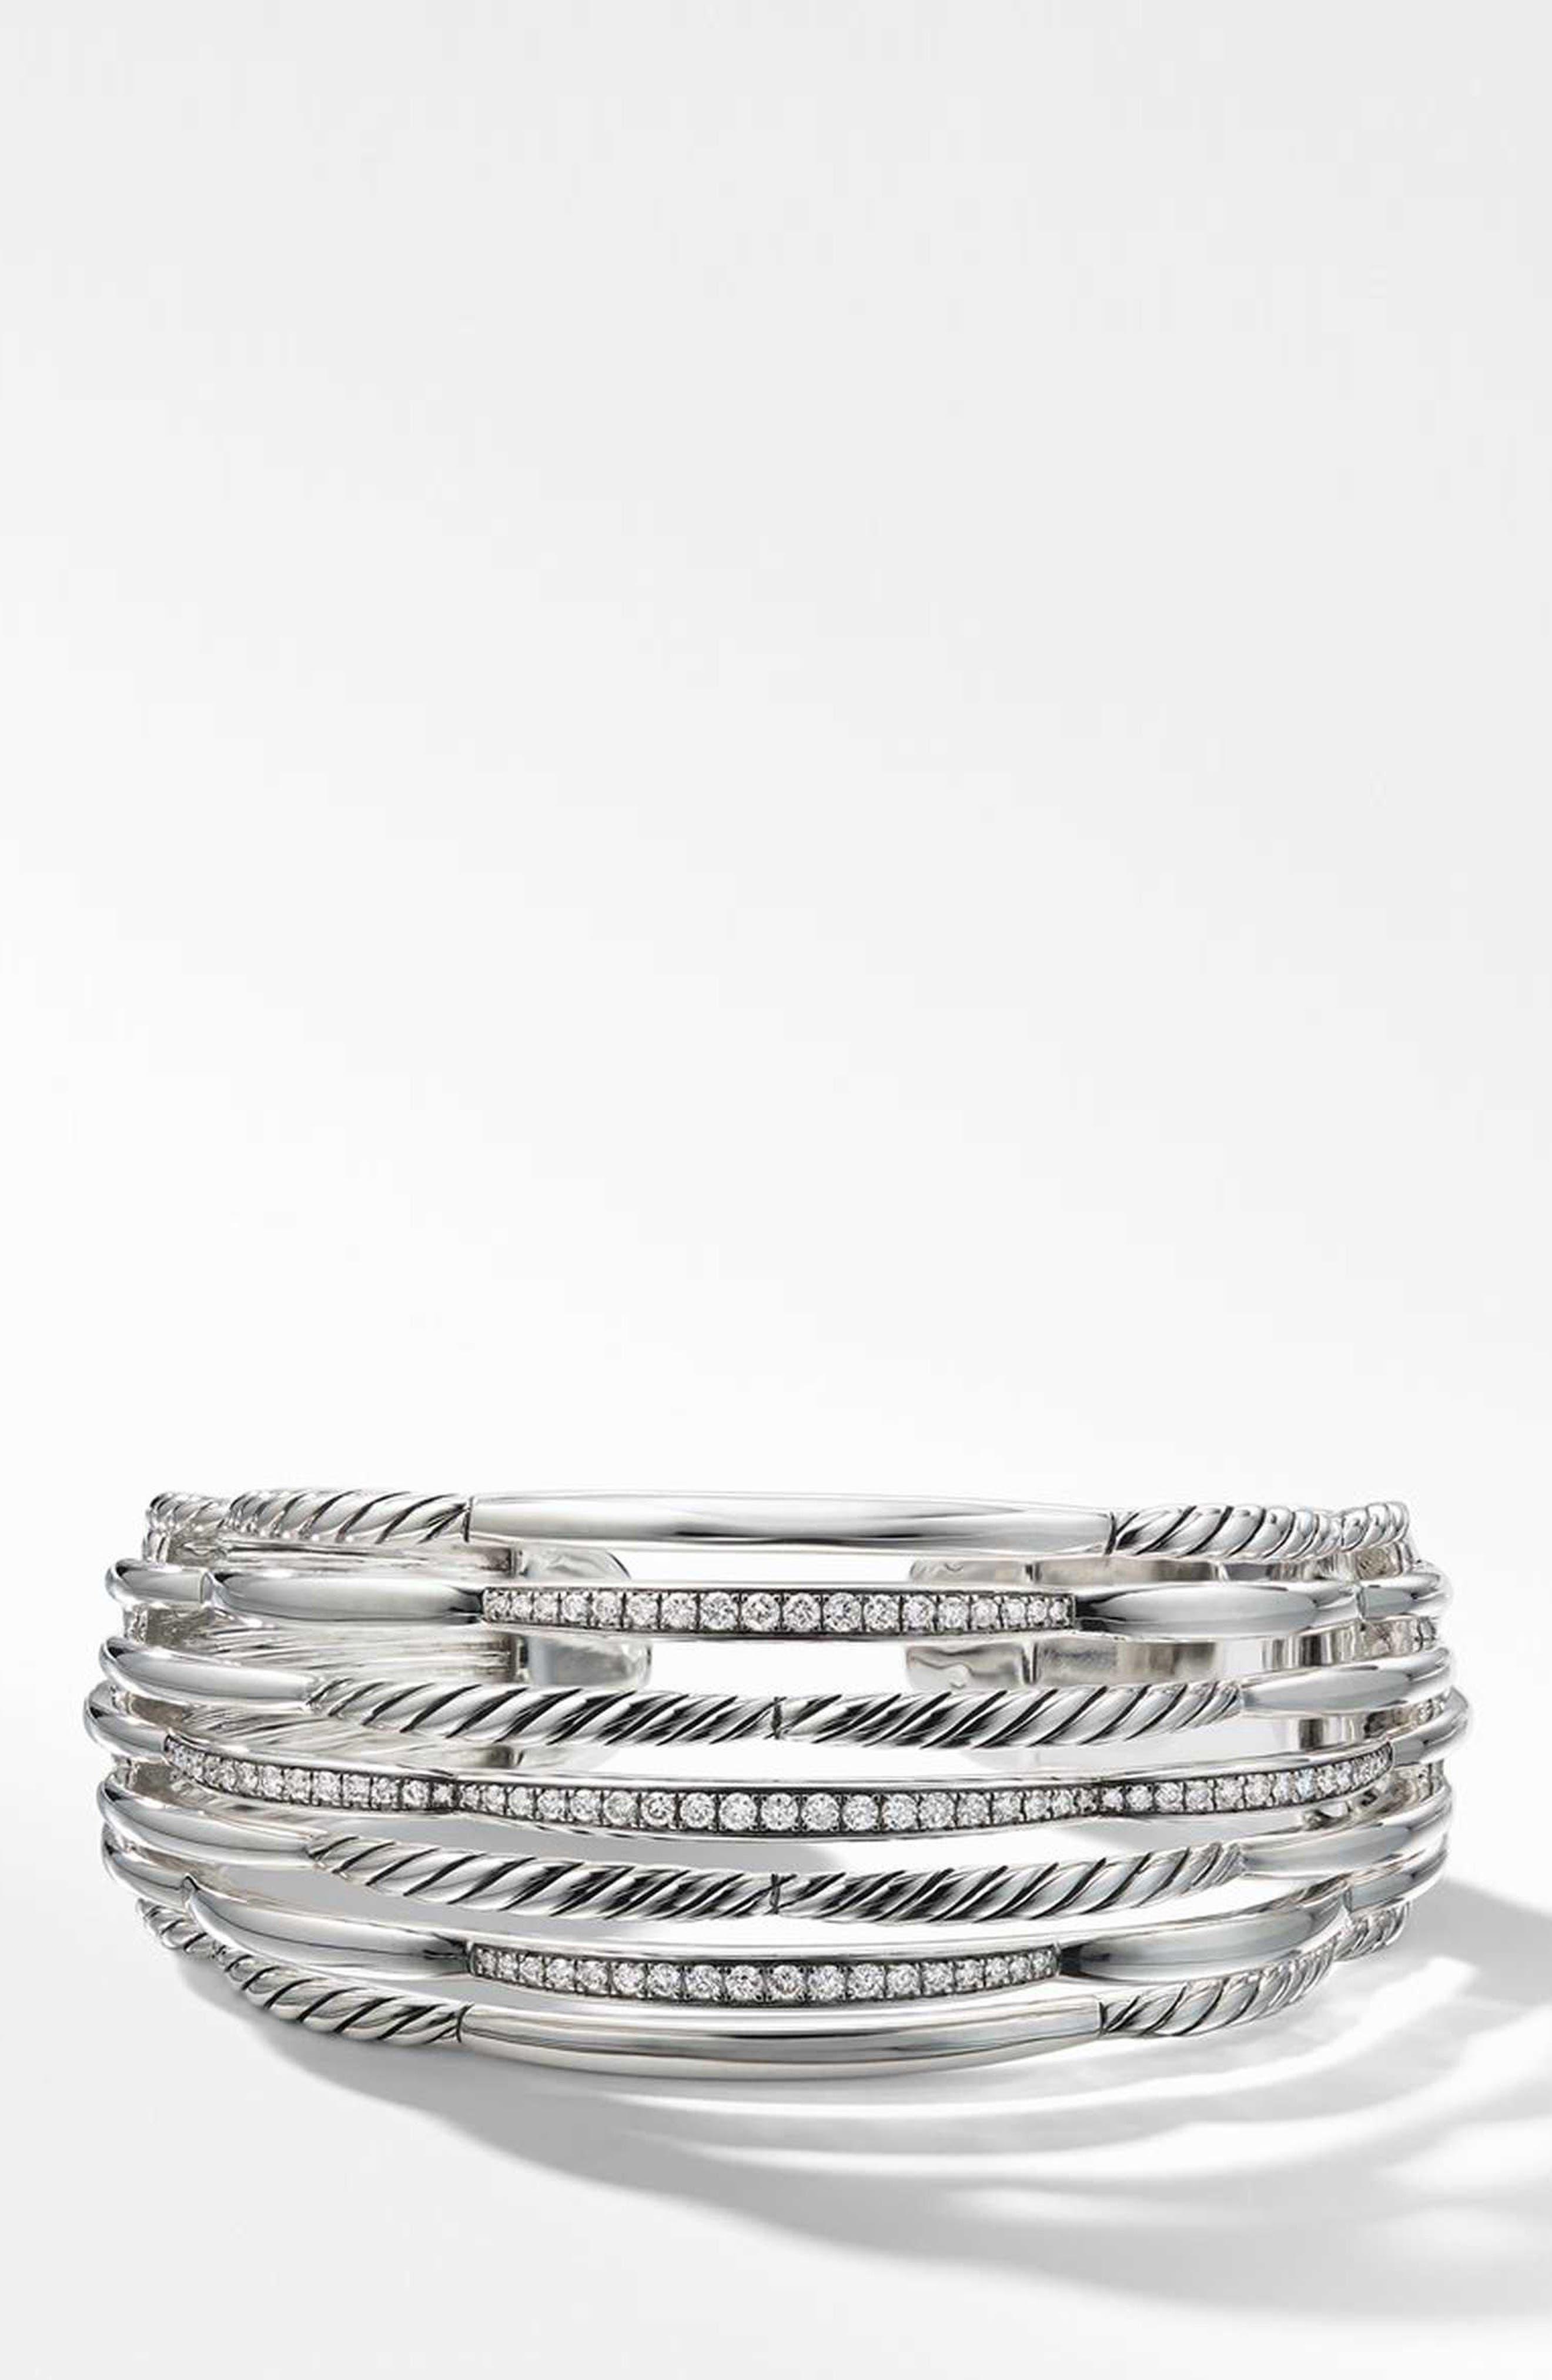 Wide Woven Cuff Bracelet with Diamonds,                         Main,                         color, STERLING SILVER/ DIAMOND